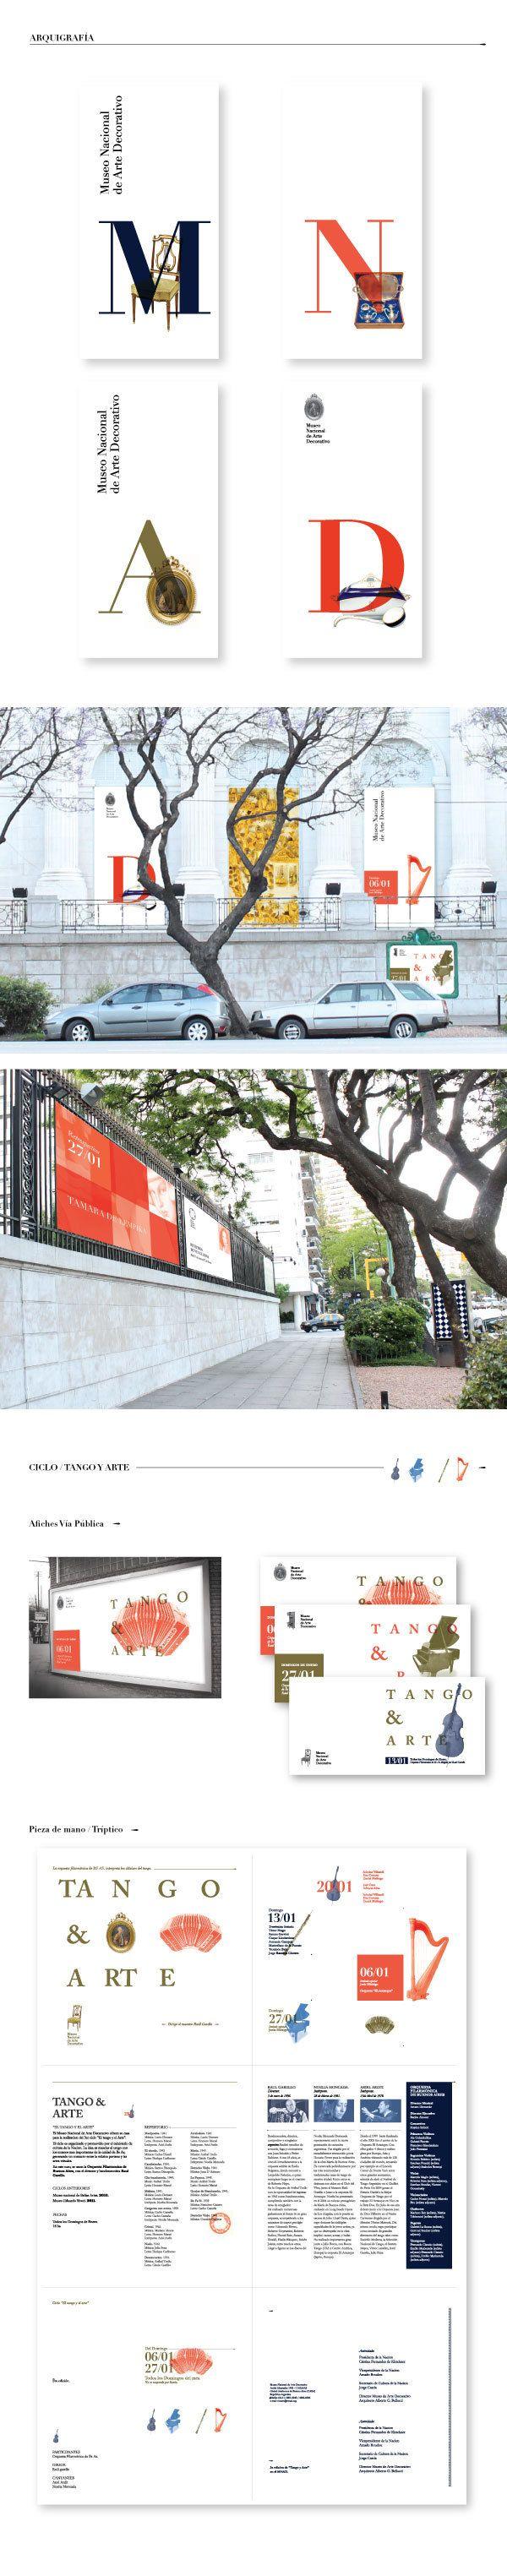 Sistema de Identidad Visual: MNAD by Gimena Drughieri, via Behance